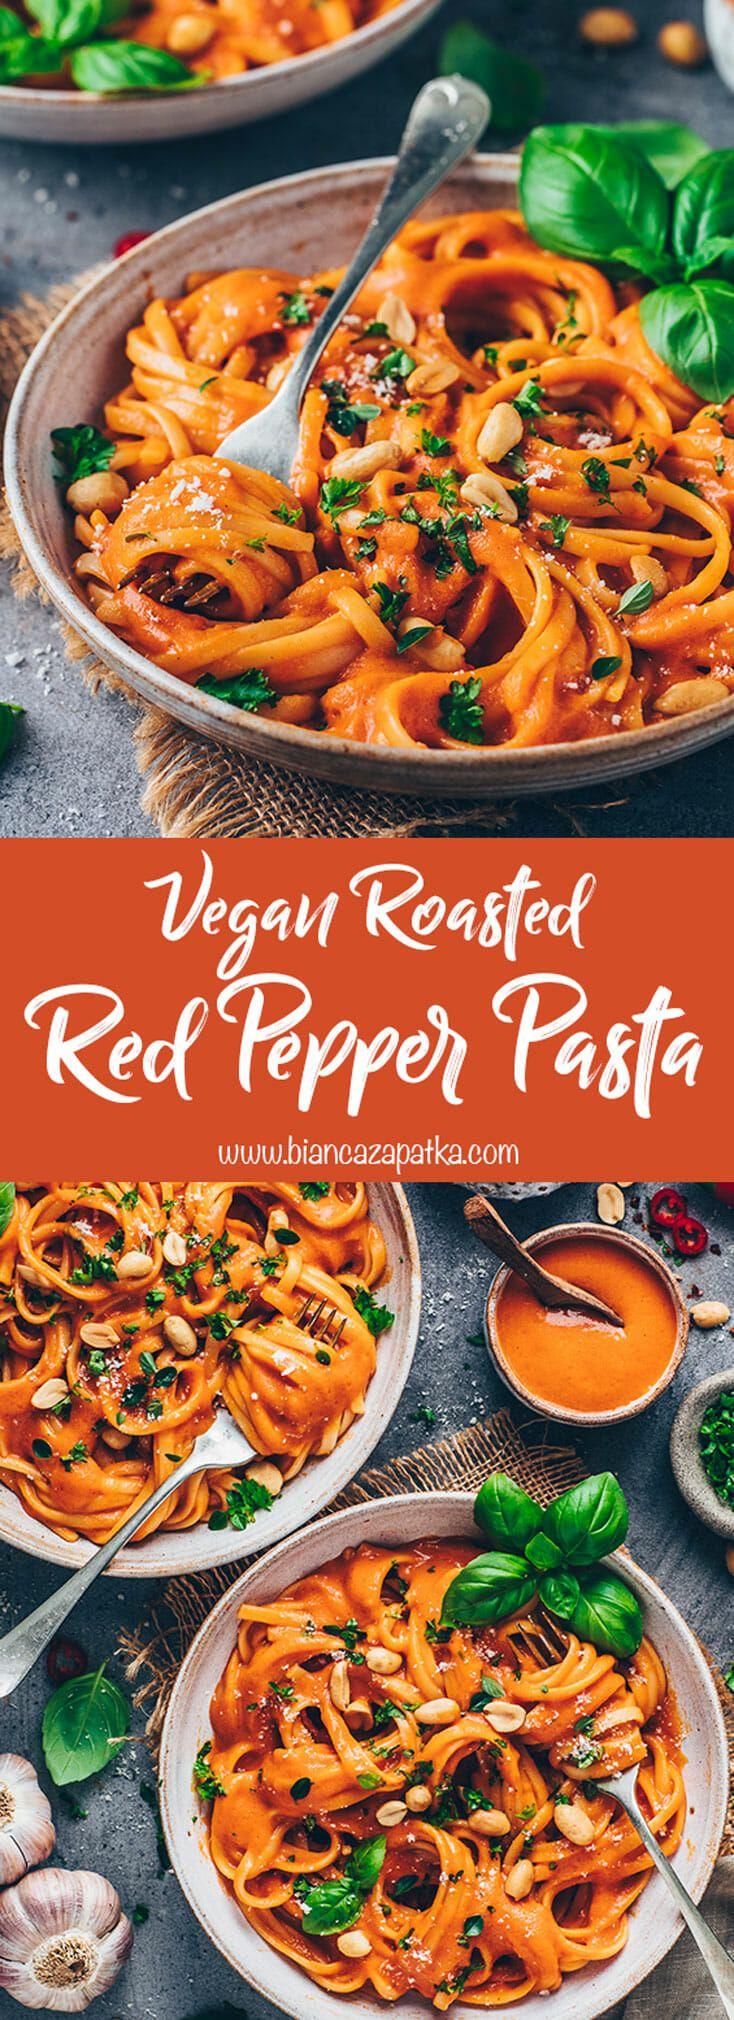 Vegan Roasted Red Pepper Pasta Sauce – Bianca Zapatka | Recipes